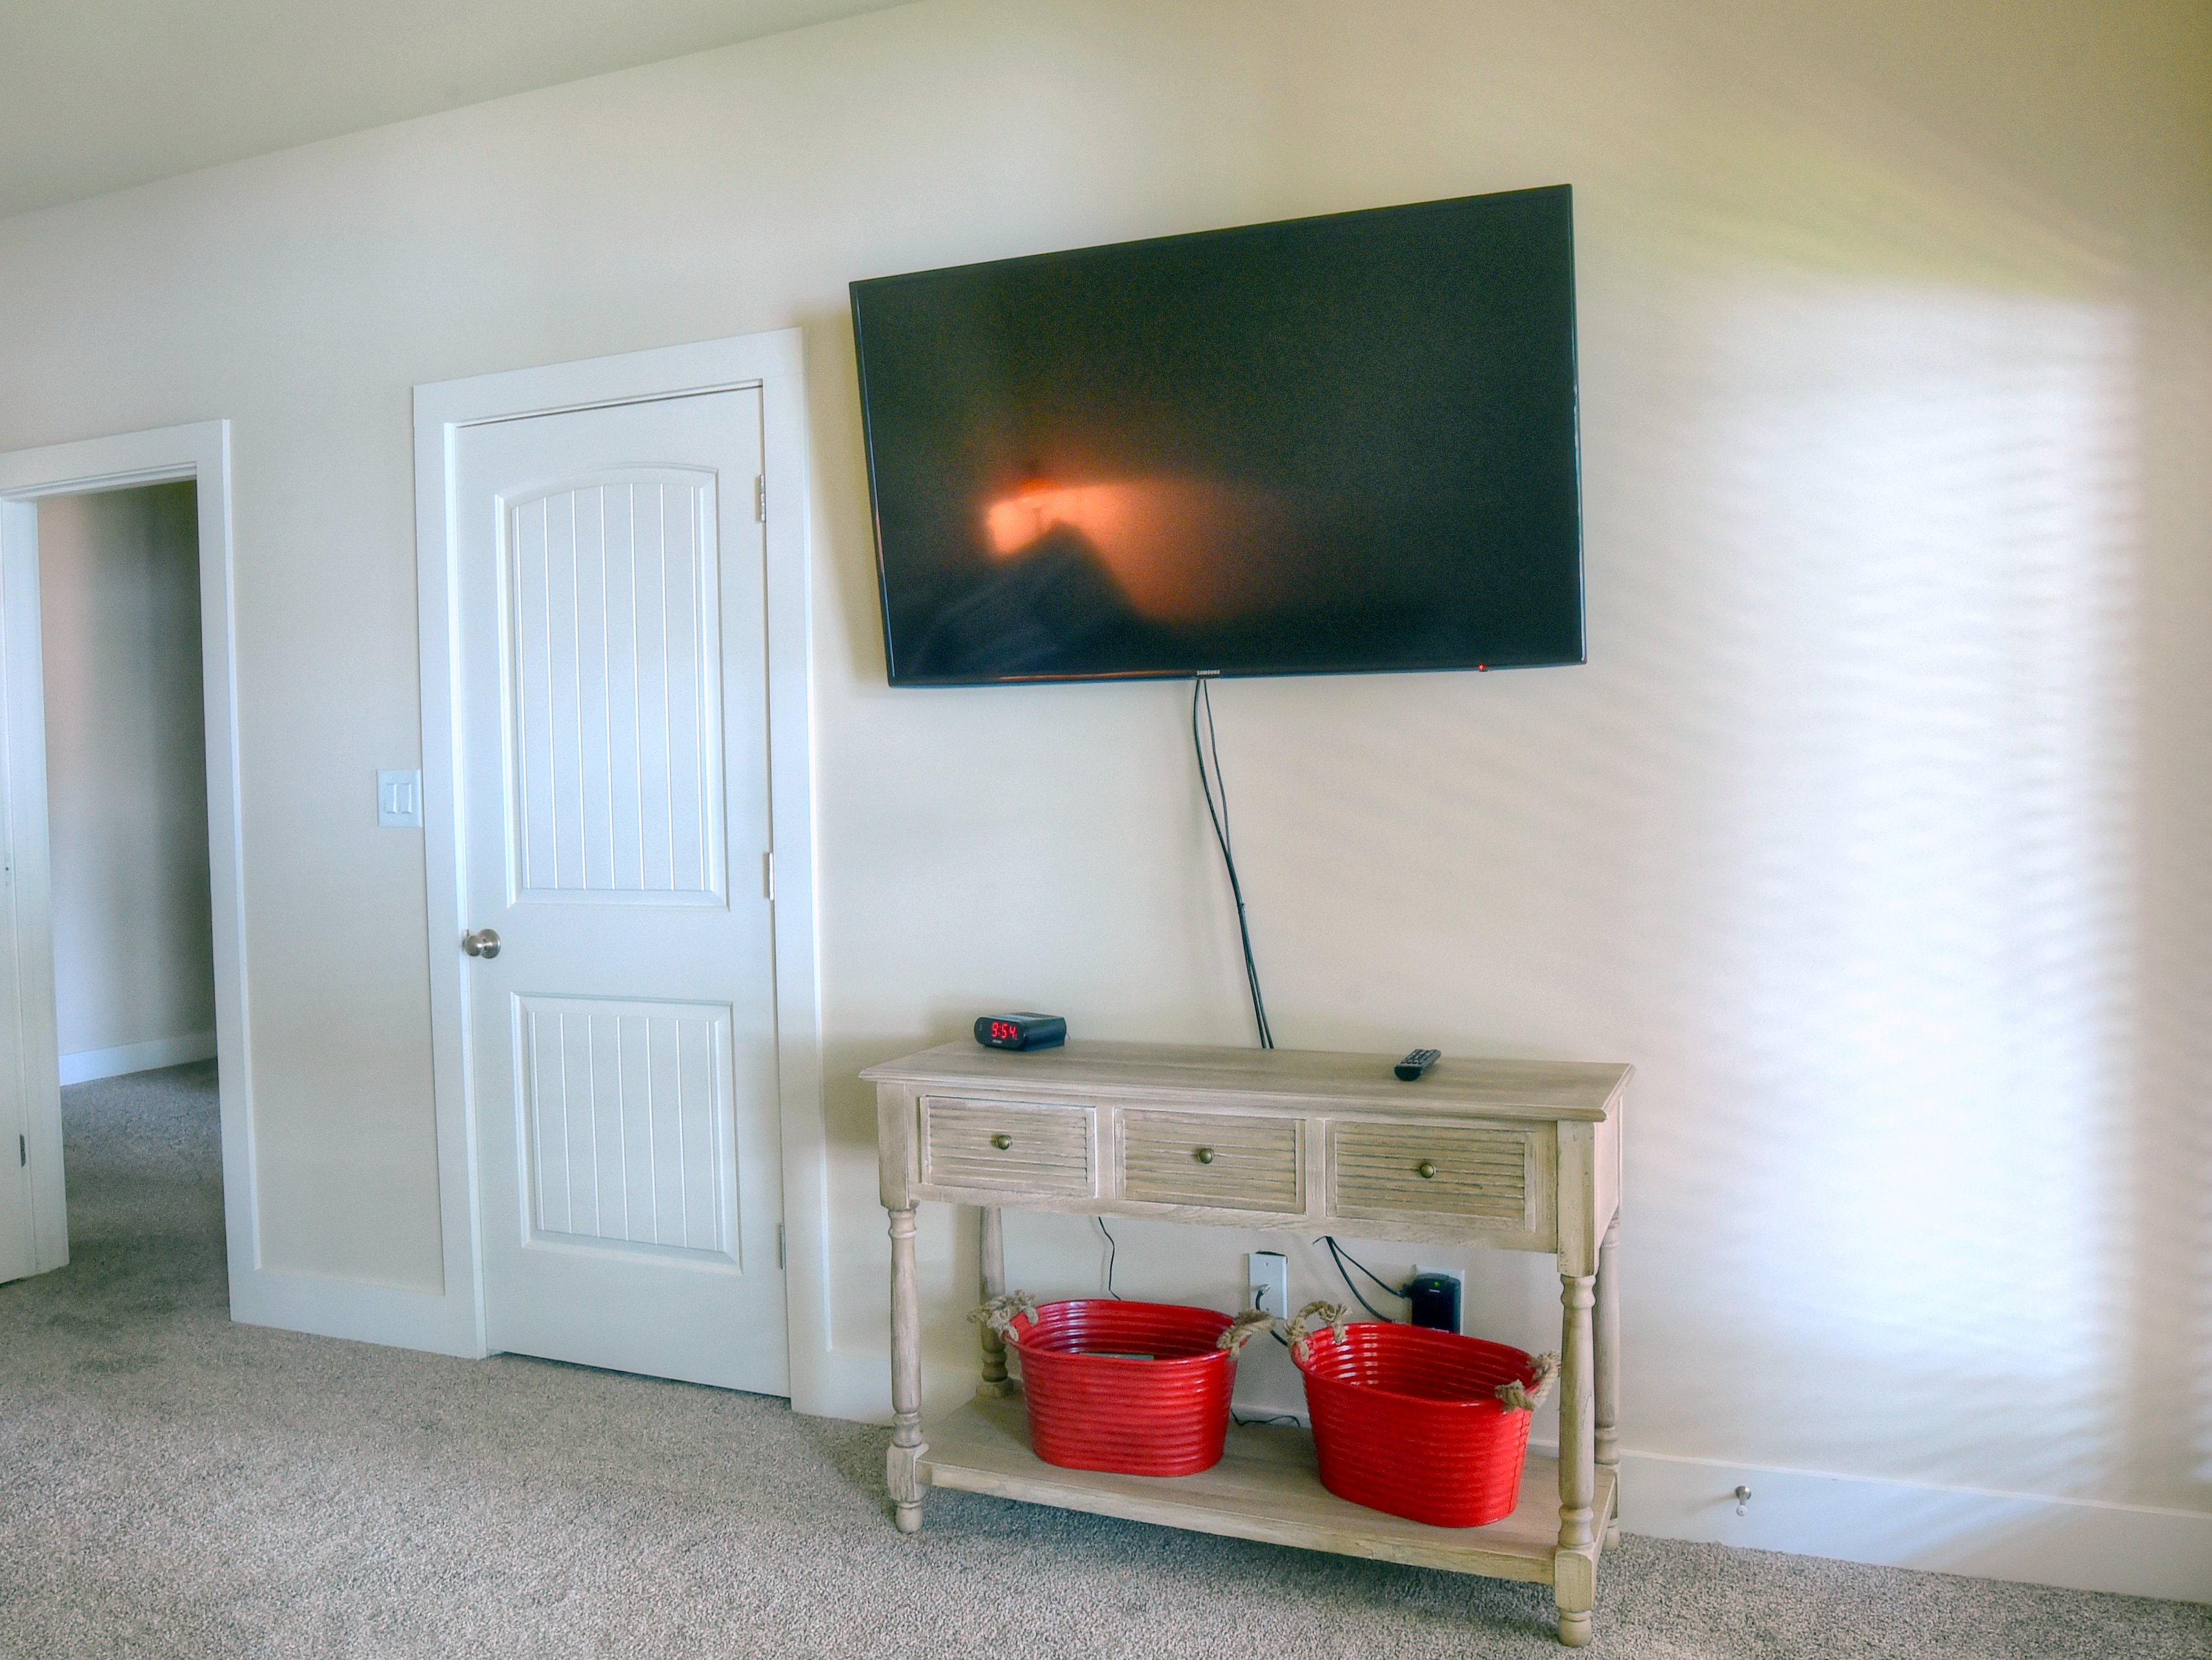 93 Beacon Point Condo rental in Sandestin Rentals ~ Cottages and Villas  in Destin Florida - #26